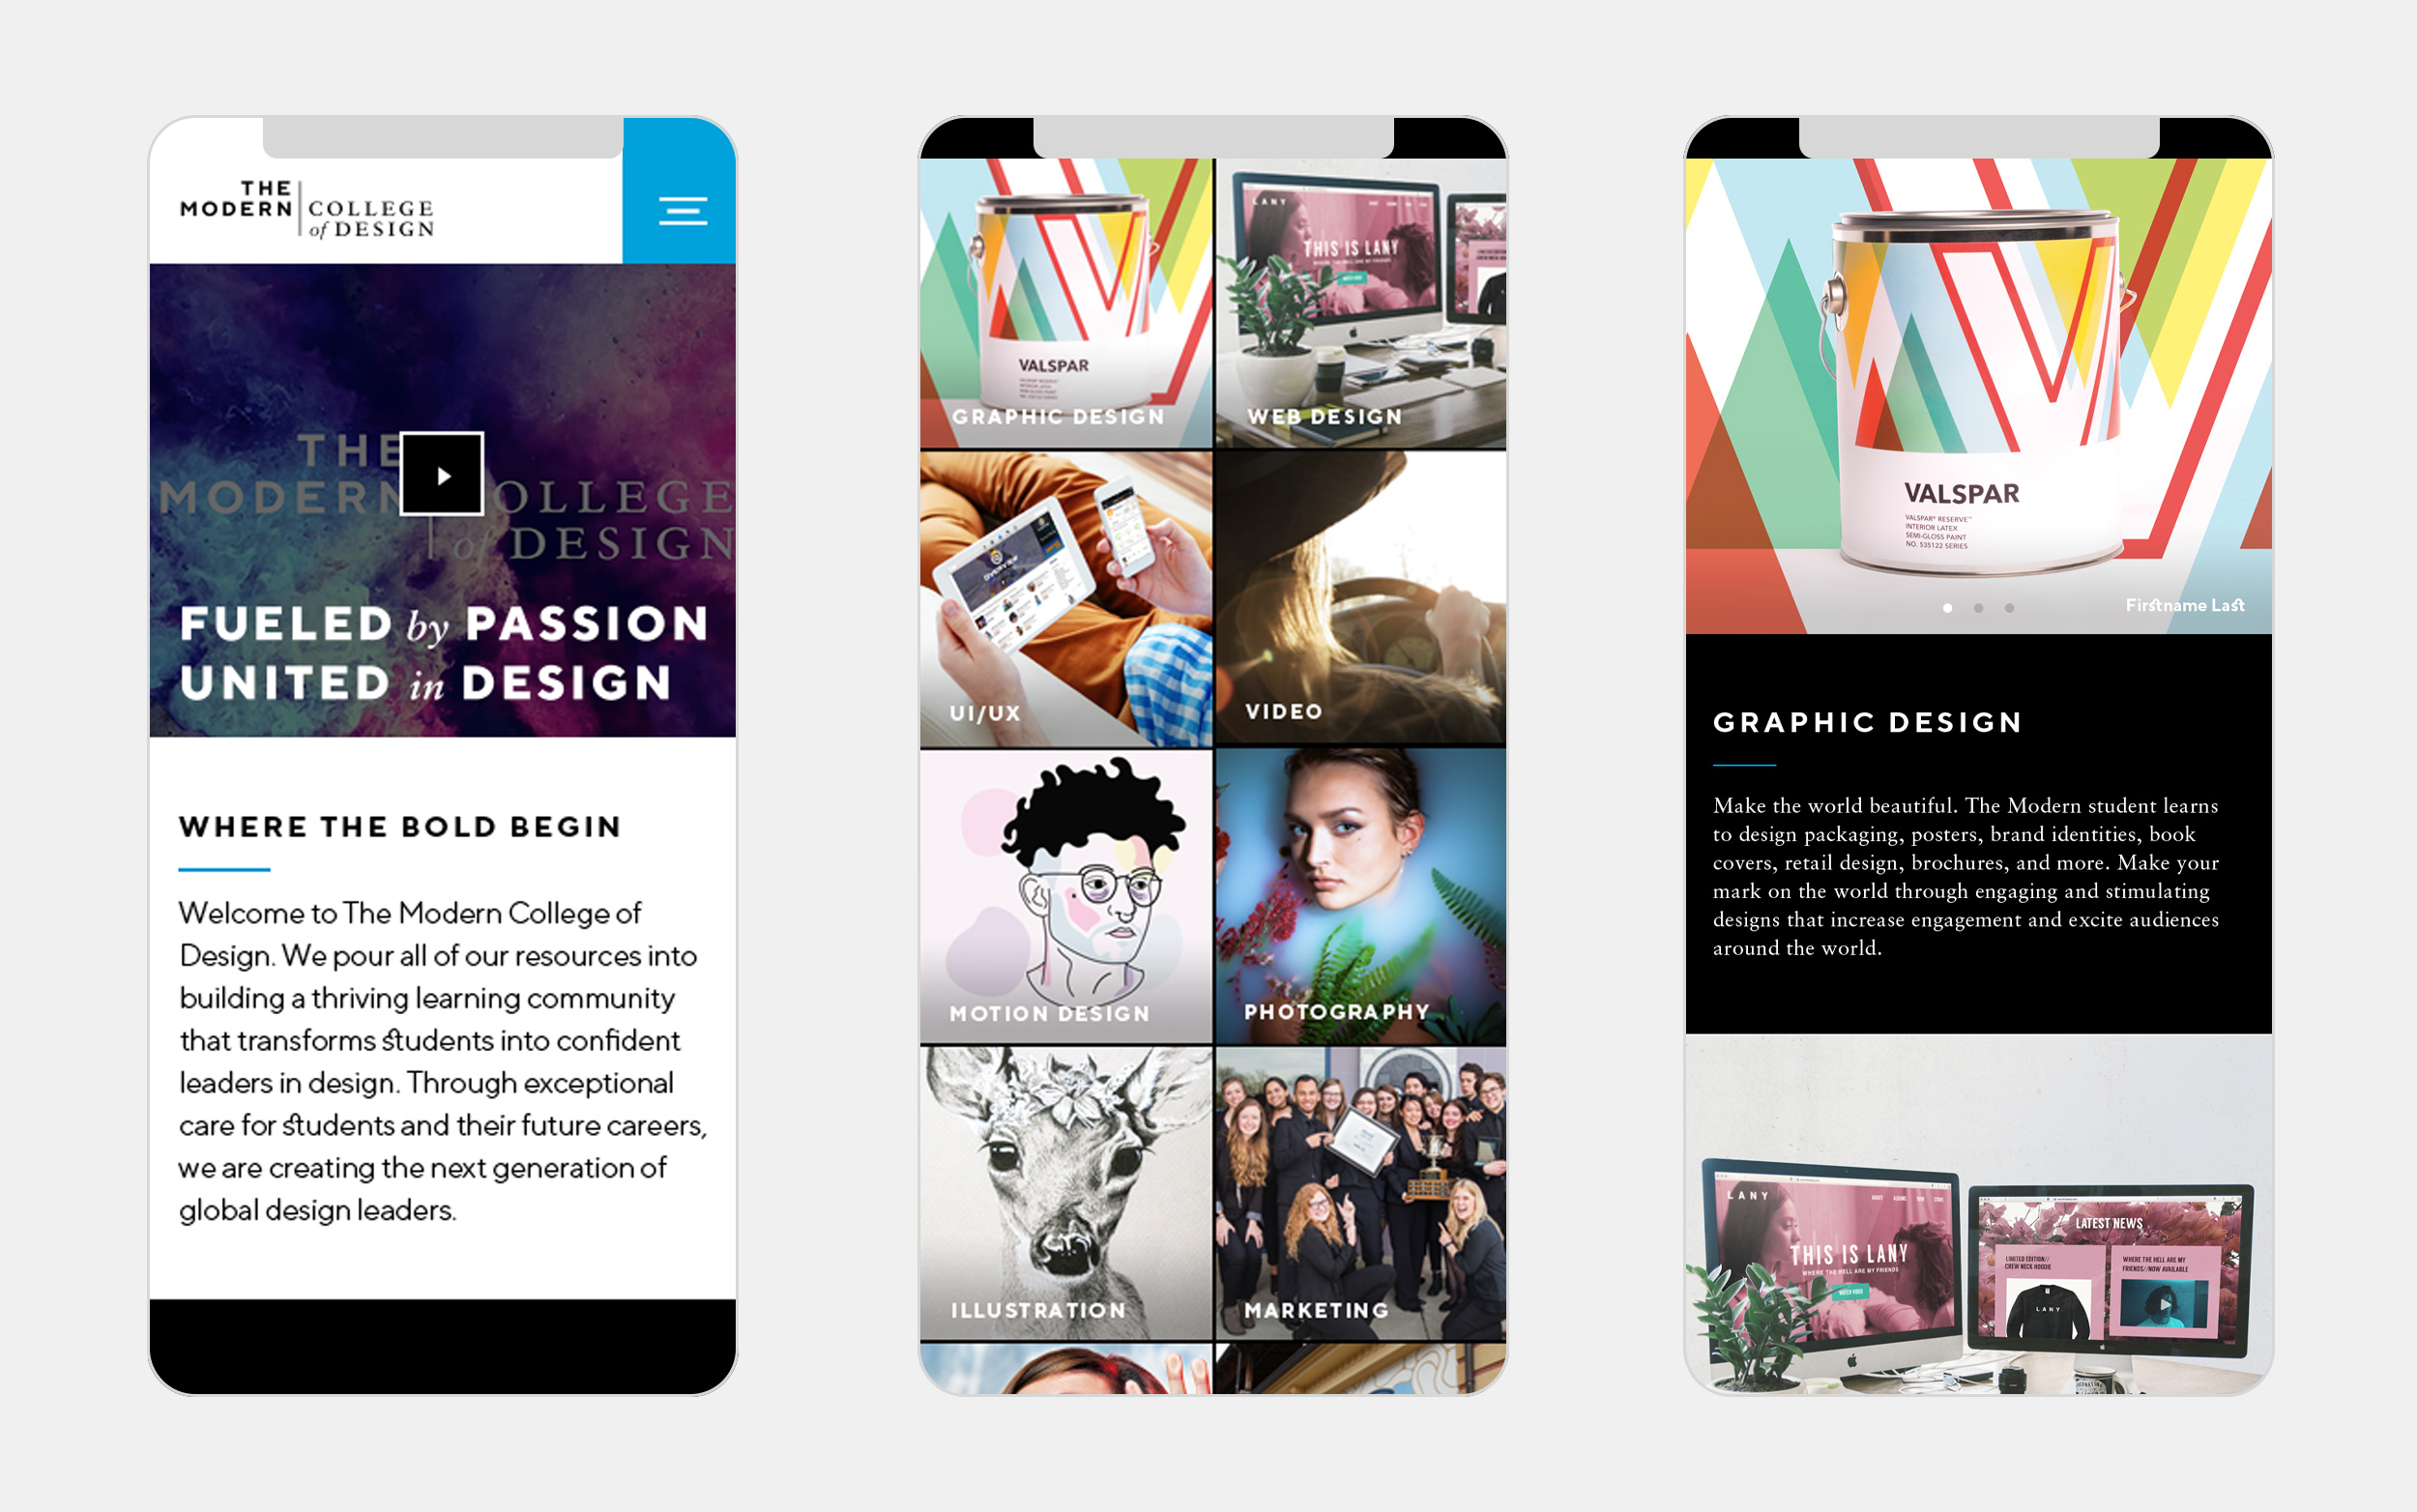 the-modern-college-of-design-website-03.jpg